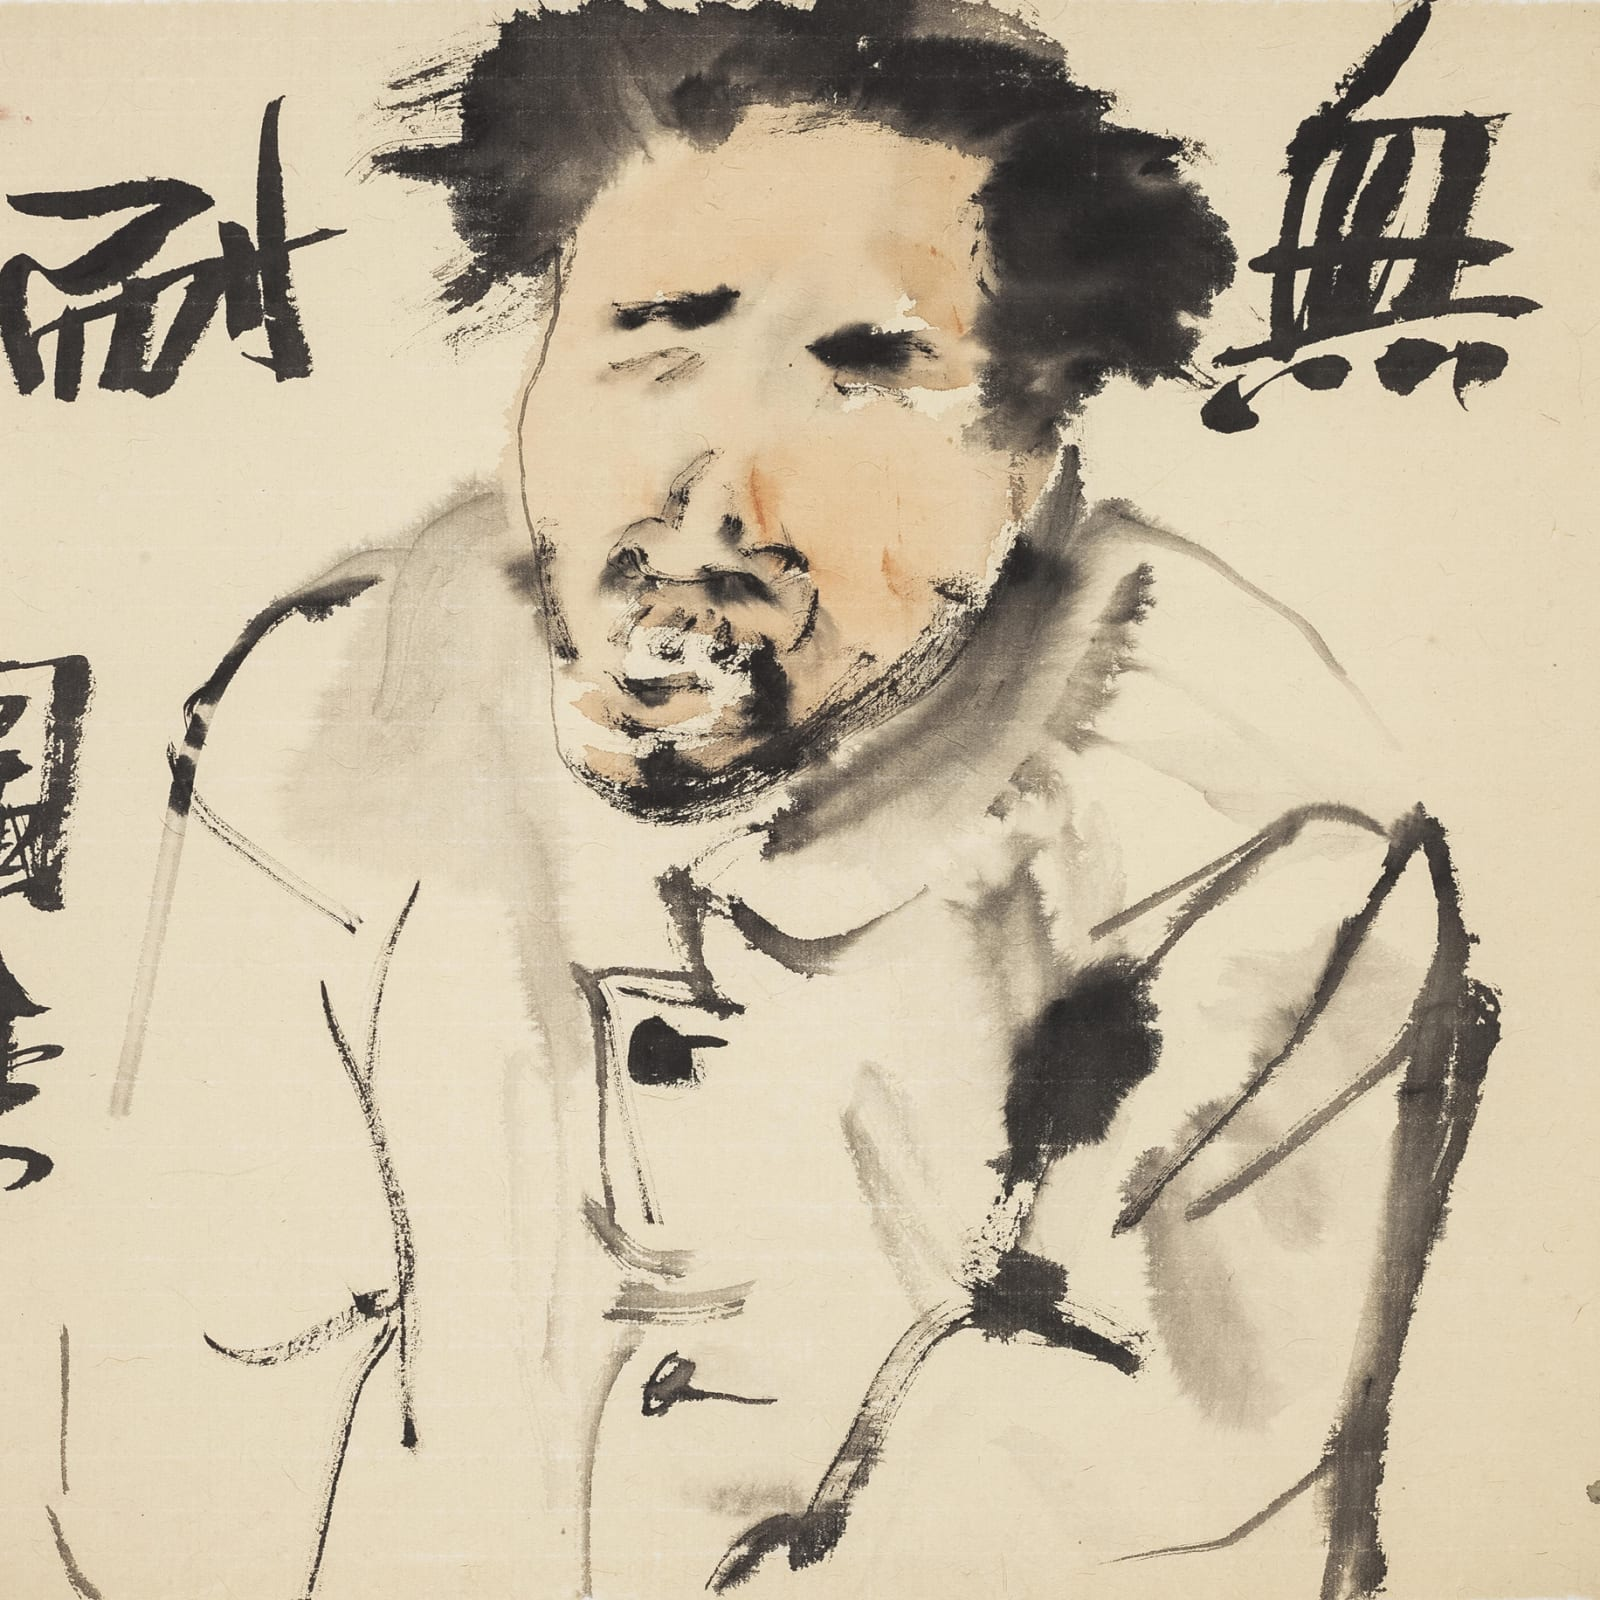 Li Jin 李津, Human Condition 无耐图, 1998